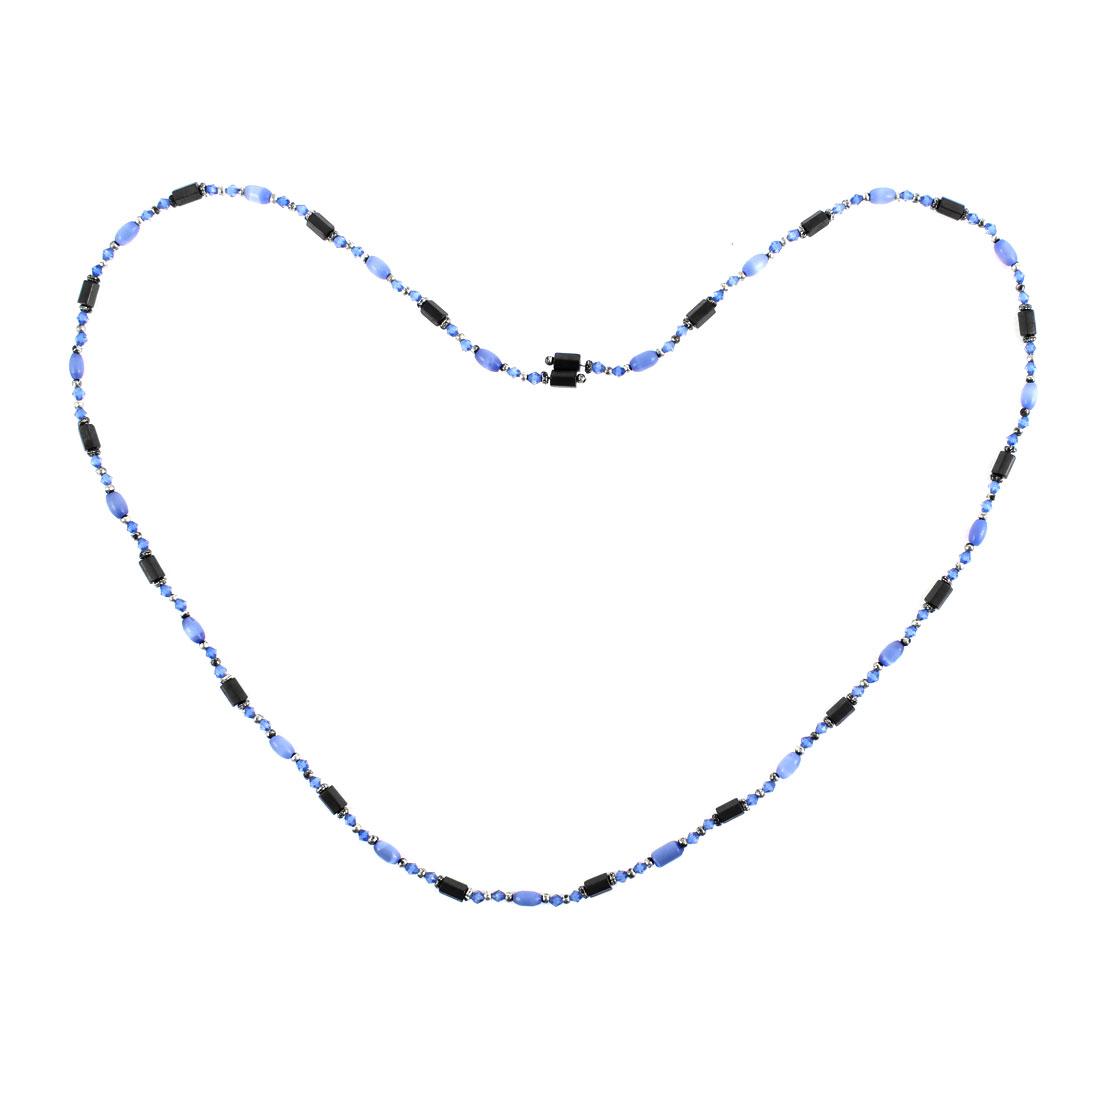 Women Magnet Clasp Hematite Magnetic Bracelet Choker Necklace Indigo Blue Black